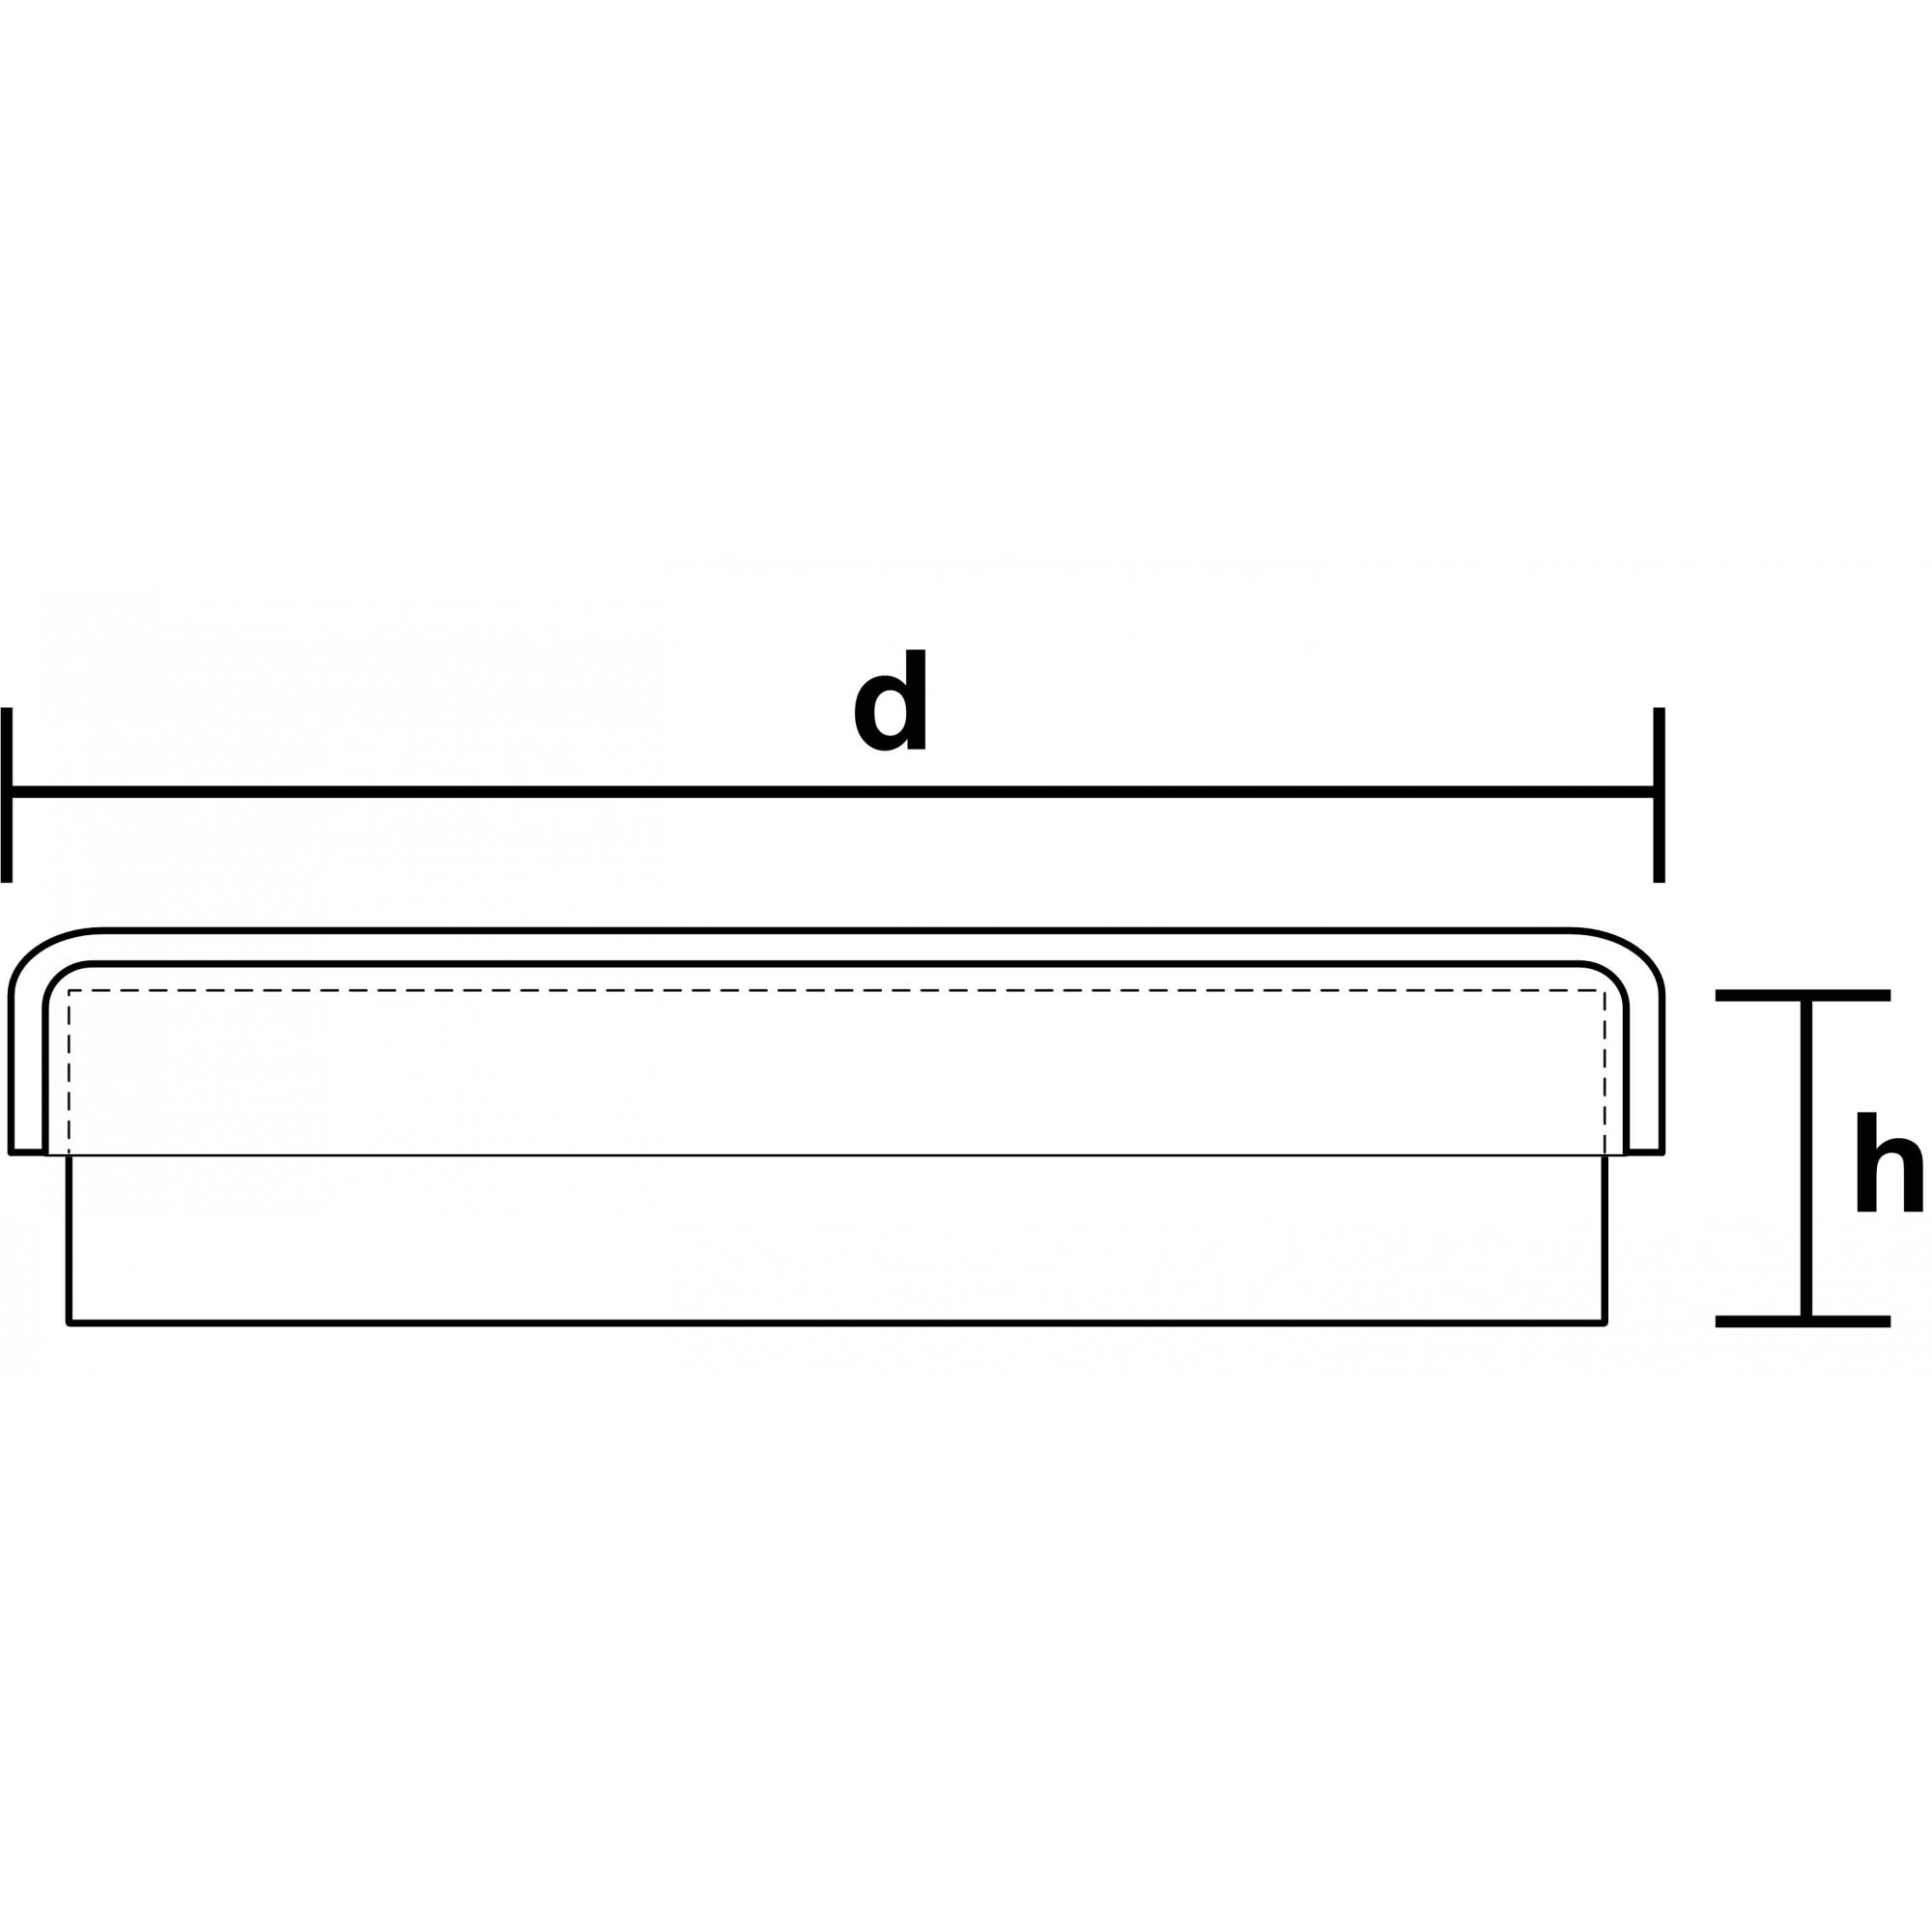 PLACA DE PETRI 90 X 15 MM - Laborglas - Cód. 9375543